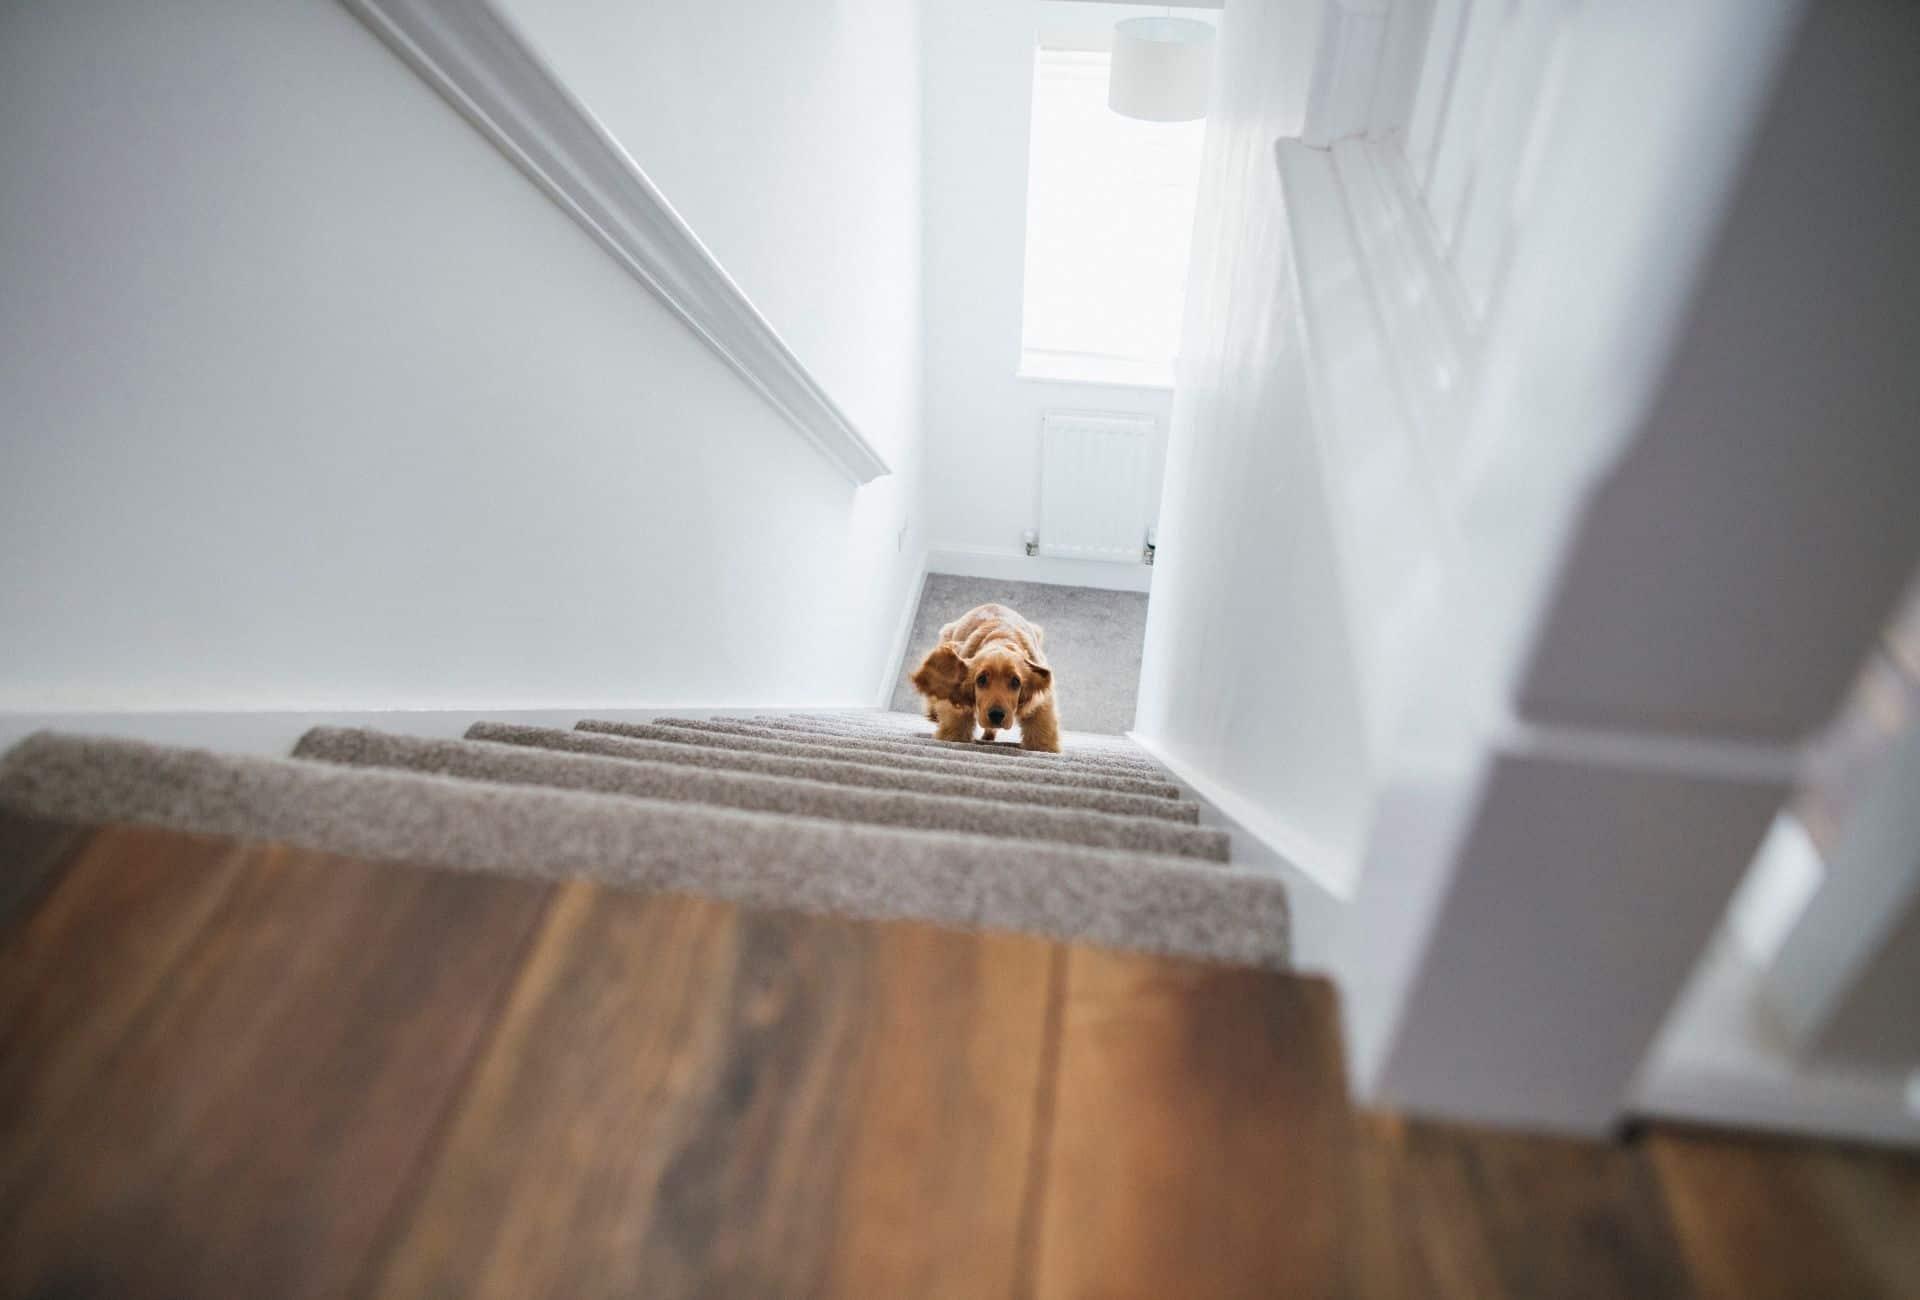 Dog climbing up stairs